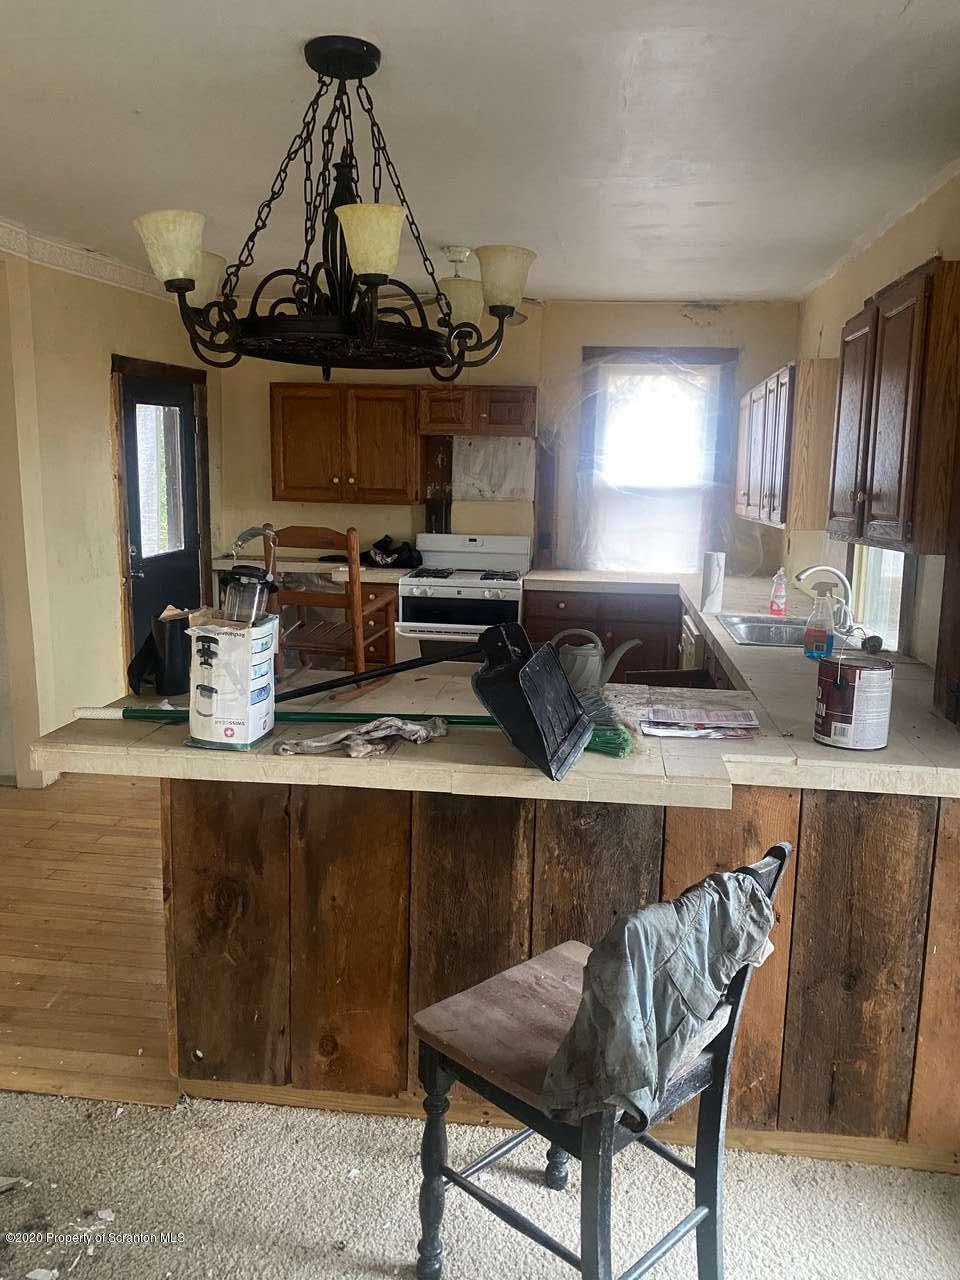 2026 Edna Ave, Scranton, Pennsylvania 18508, 3 Bedrooms Bedrooms, 6 Rooms Rooms,1 BathroomBathrooms,Single Family,For Sale,Edna,20-4997